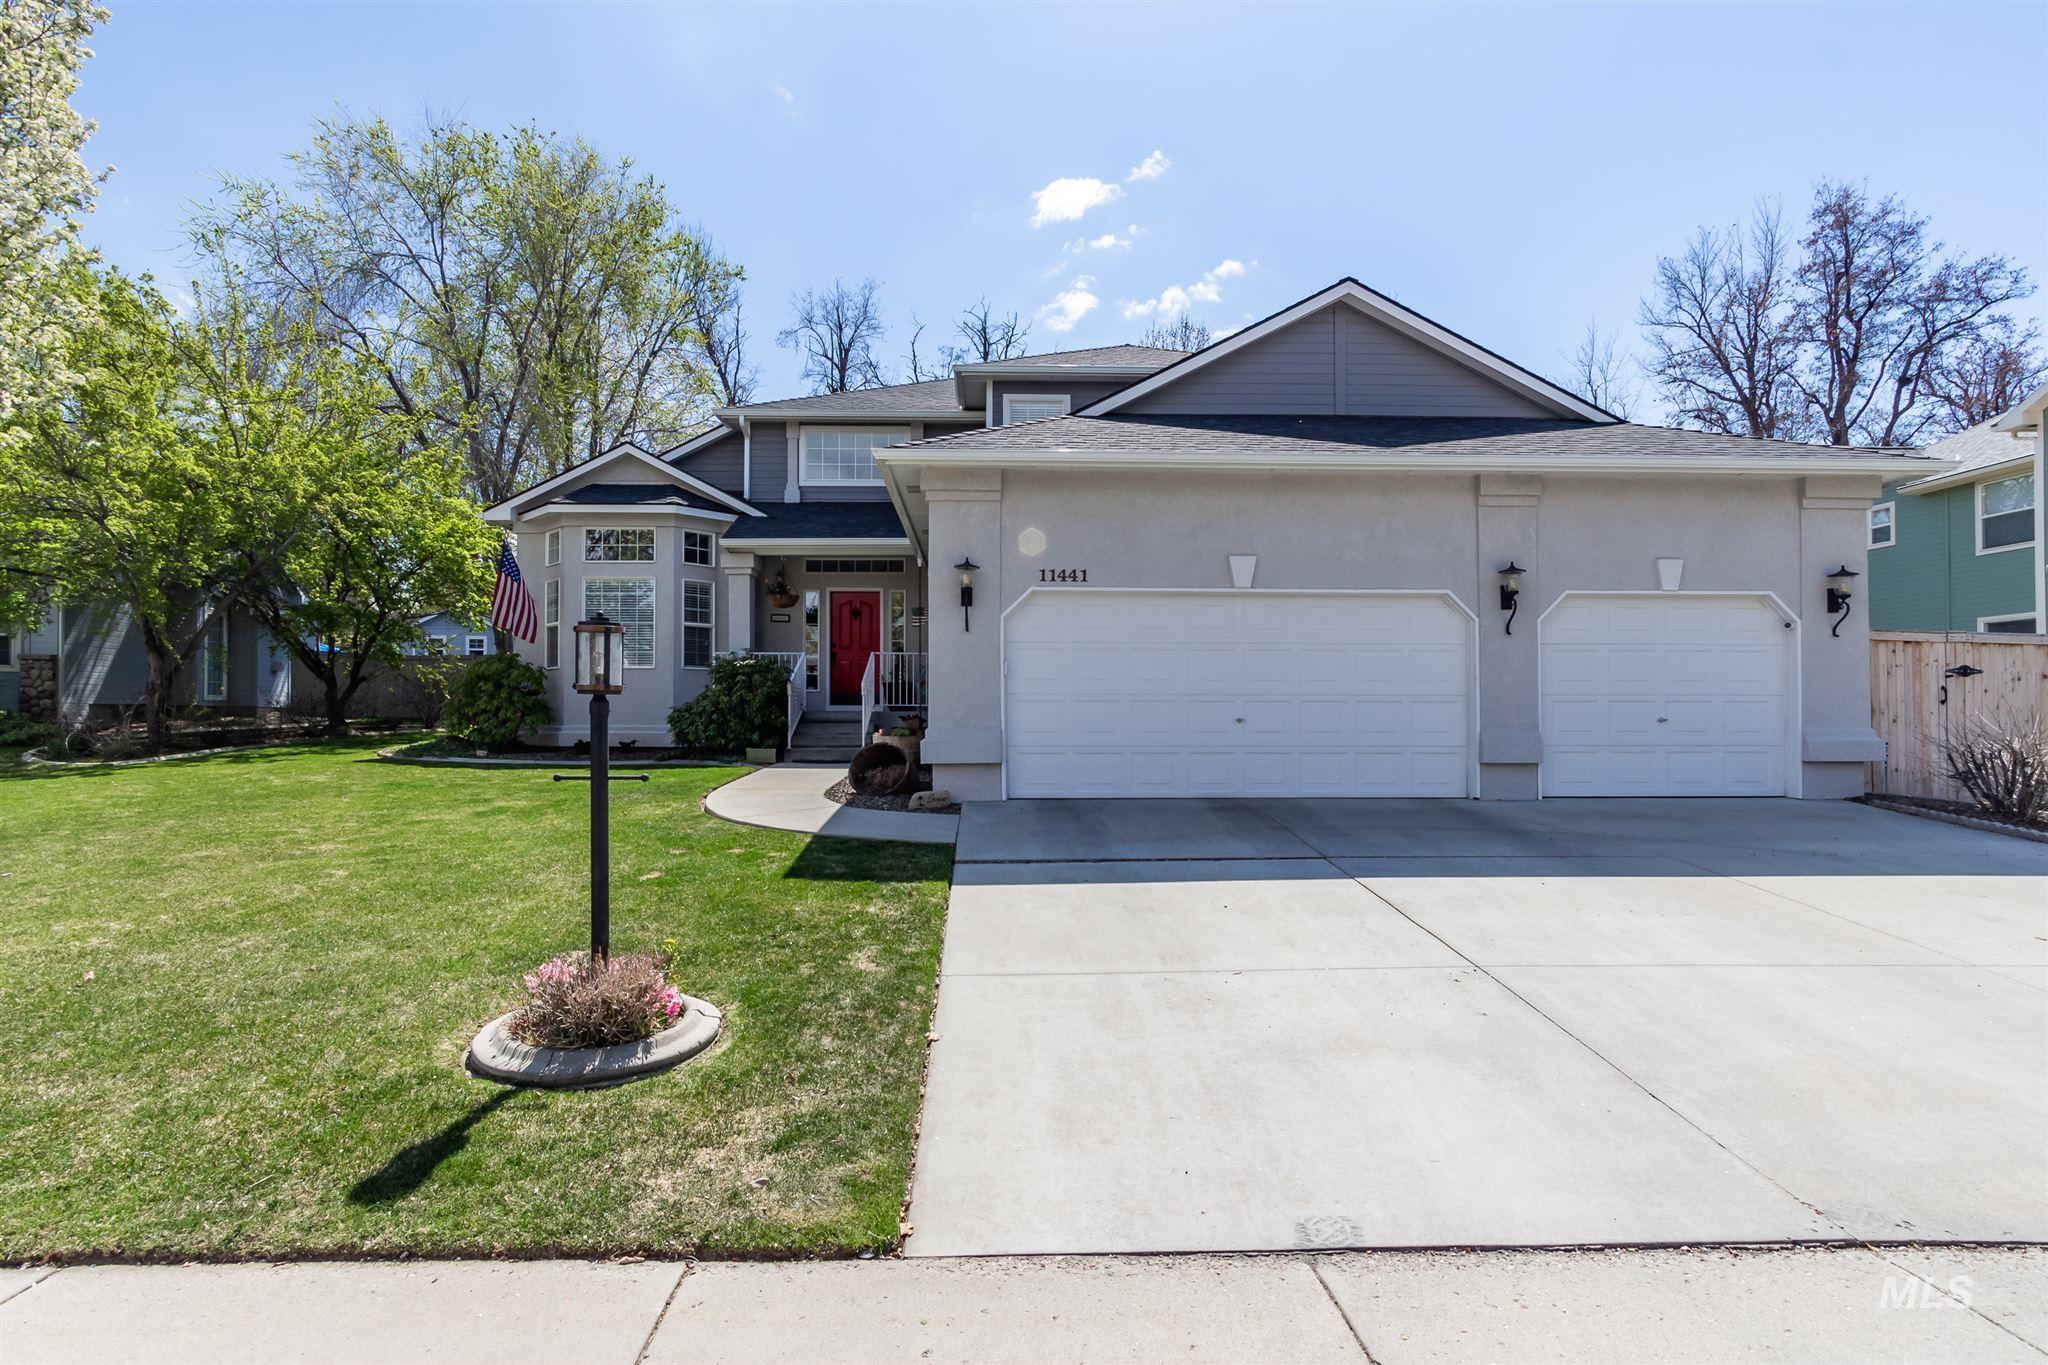 11441 W Puritan Dr Property Photo - Boise, ID real estate listing